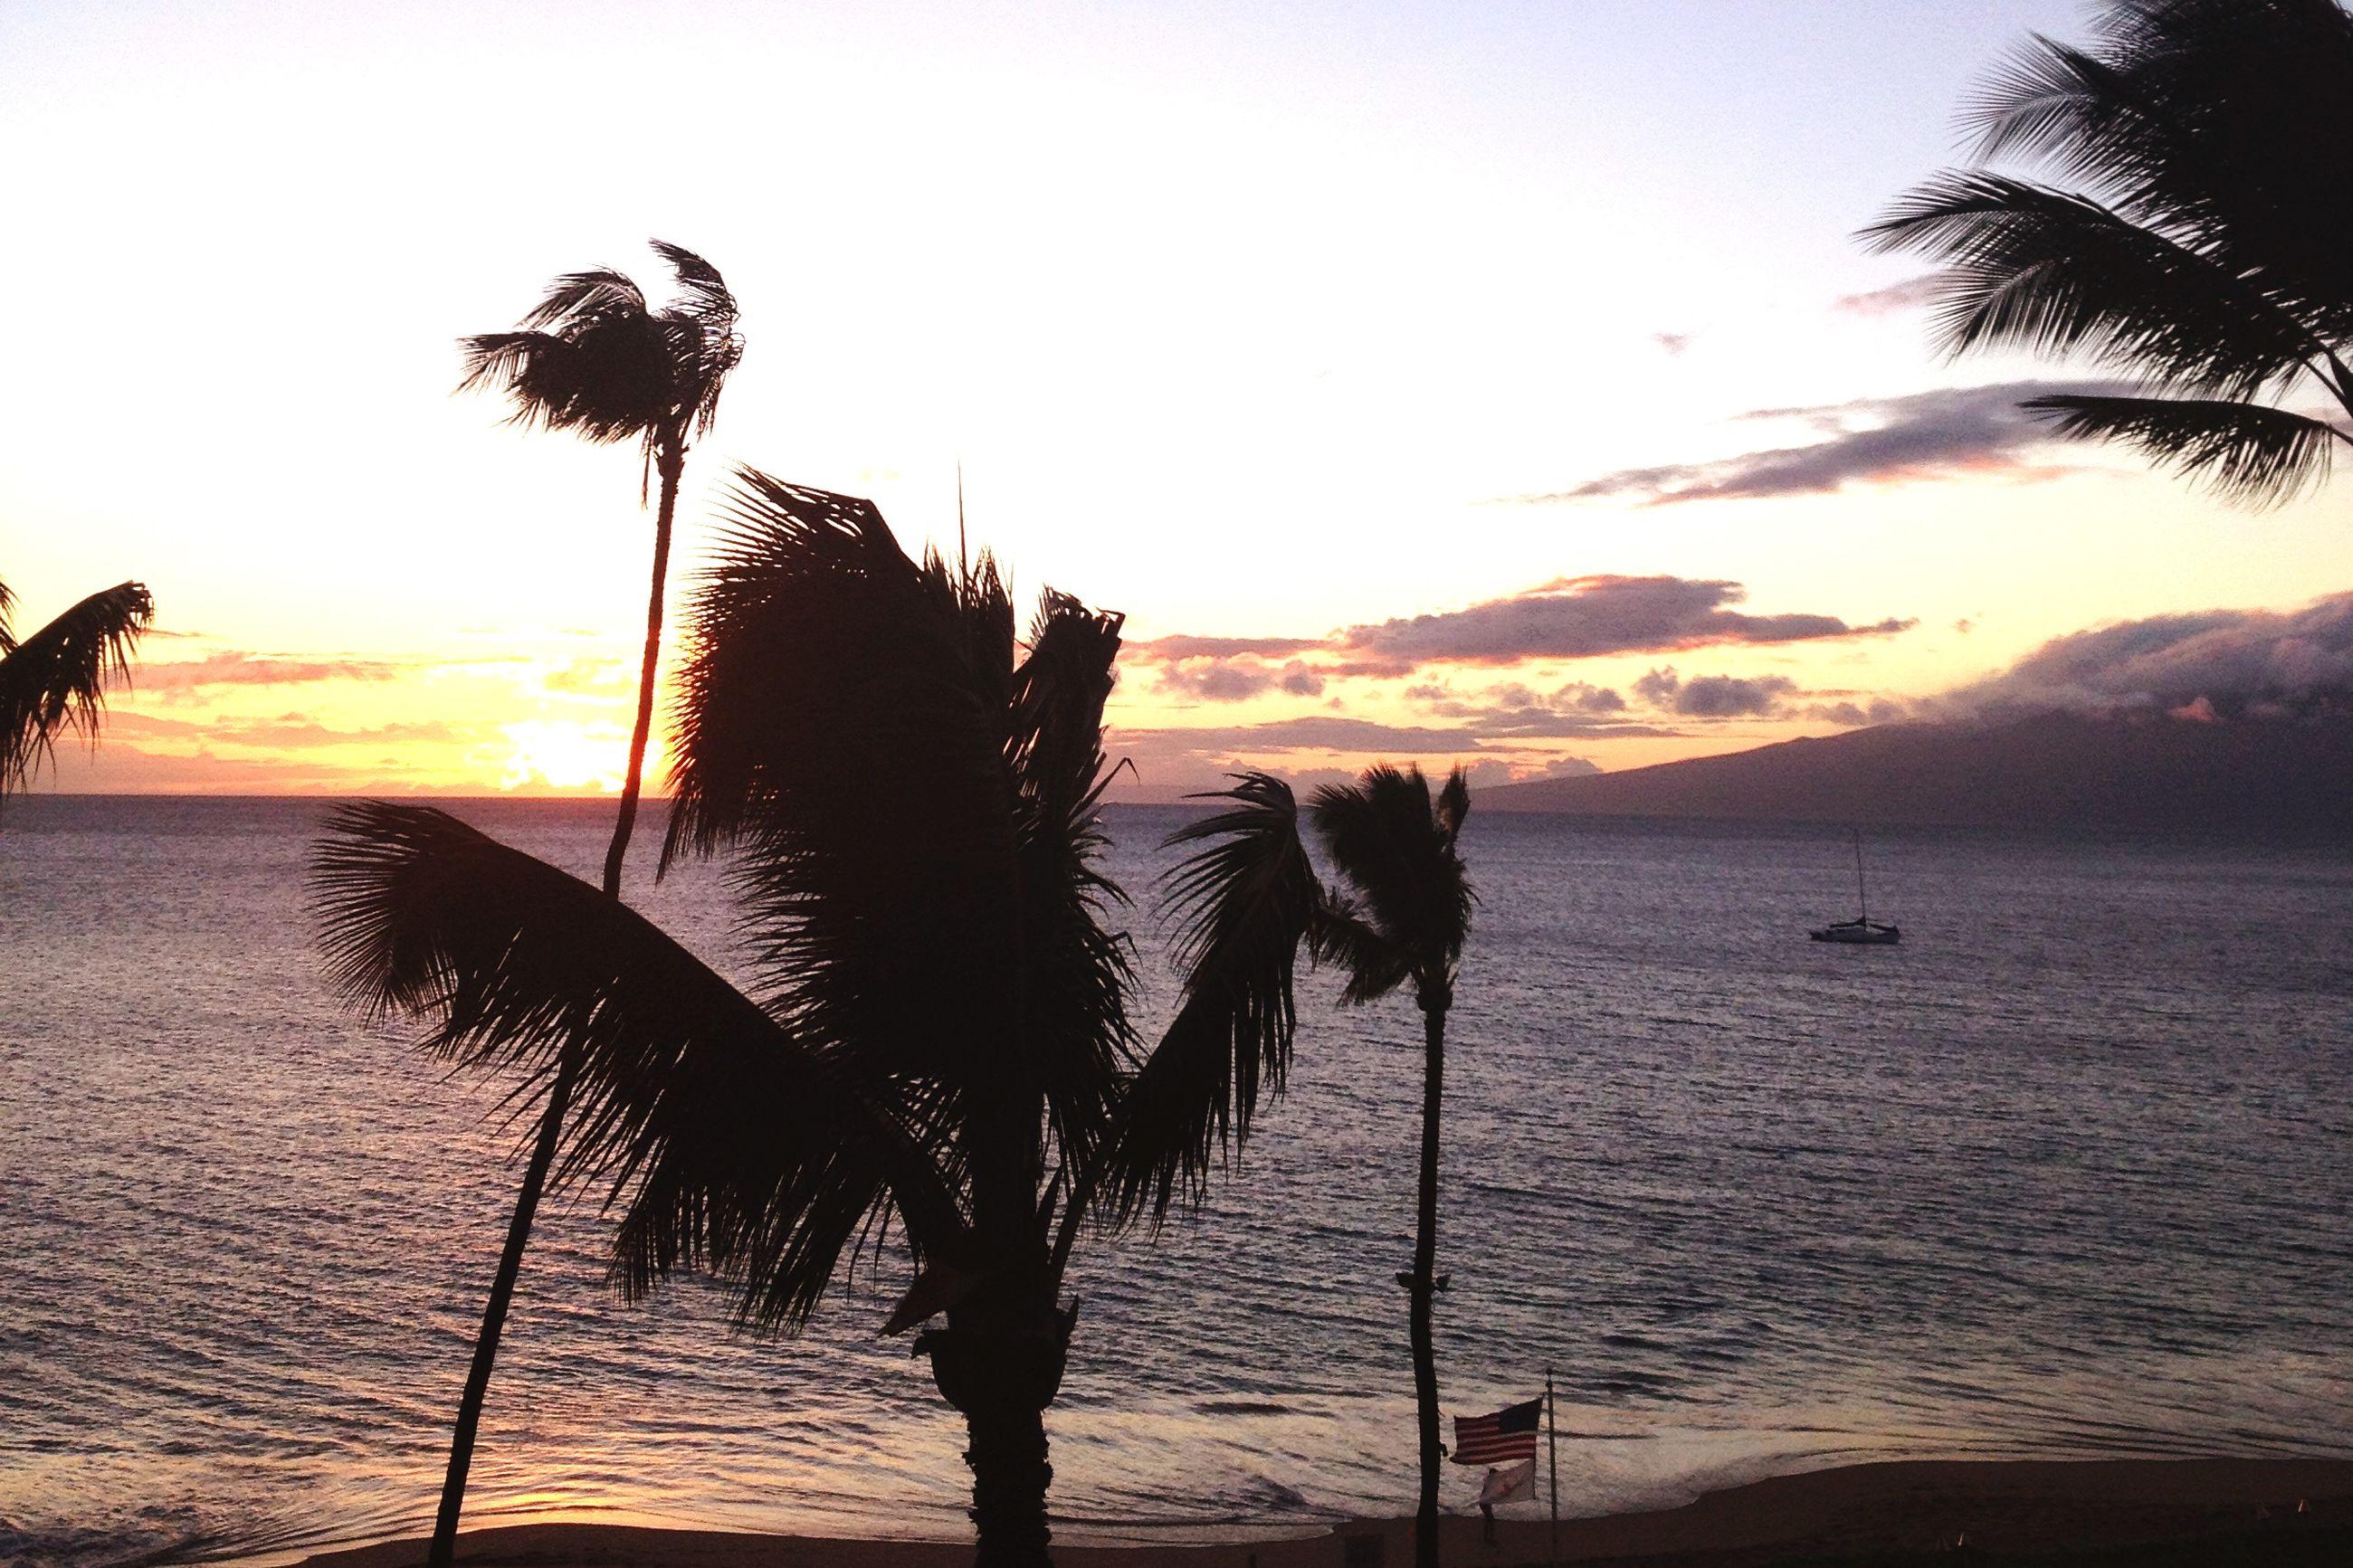 sea, water, sunset, silhouette, tranquility, horizon over water, tranquil scene, beach, scenics, sky, beauty in nature, palm tree, nature, shore, idyllic, tree, ocean, outdoors, dusk, non-urban scene